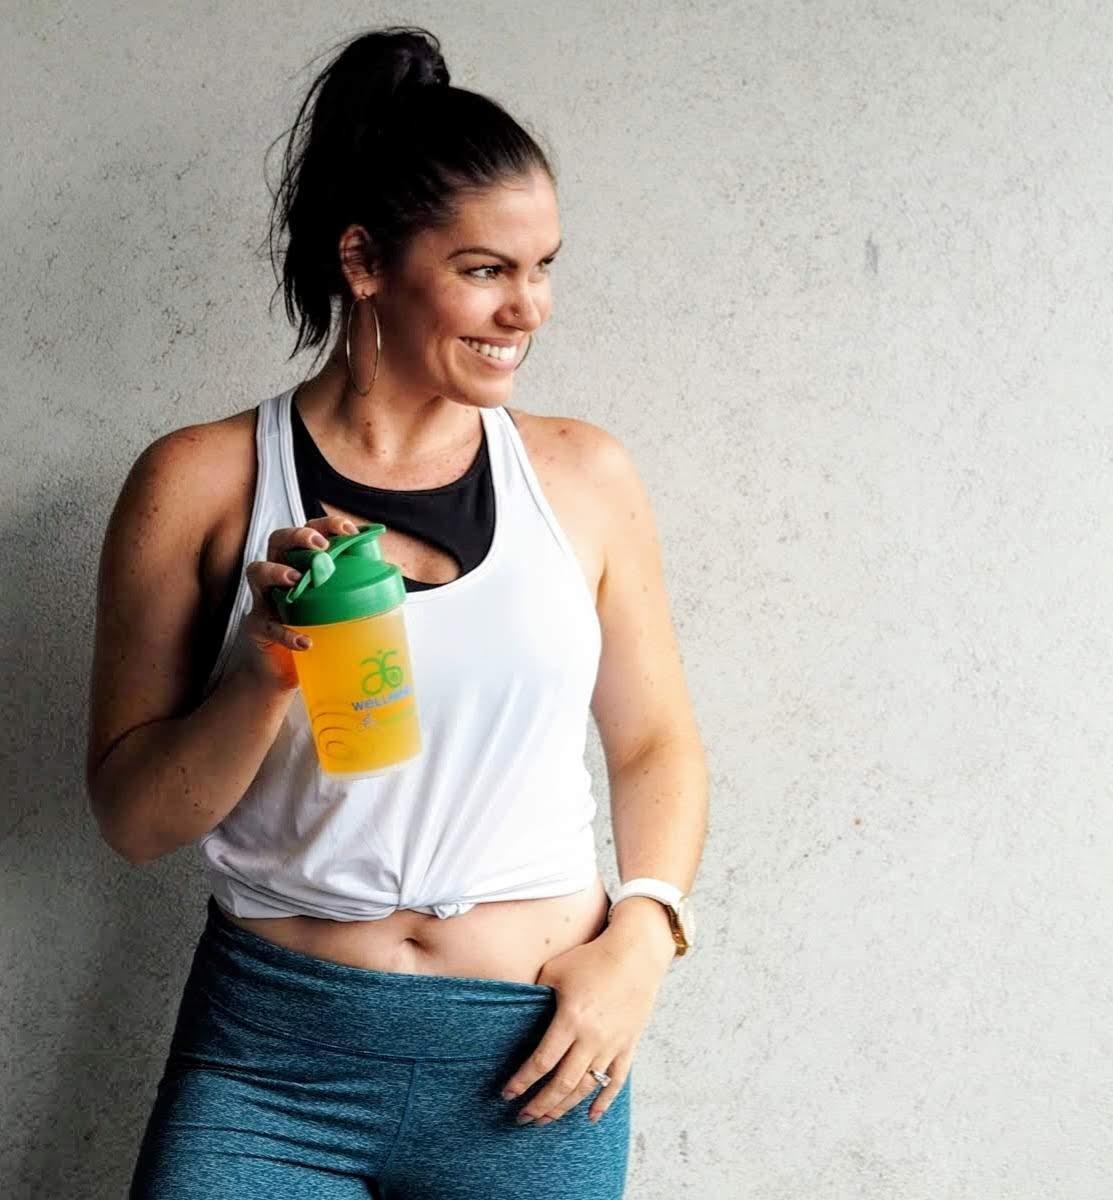 51 ways to healthier happier year lifestyle blog samantha clark waters active